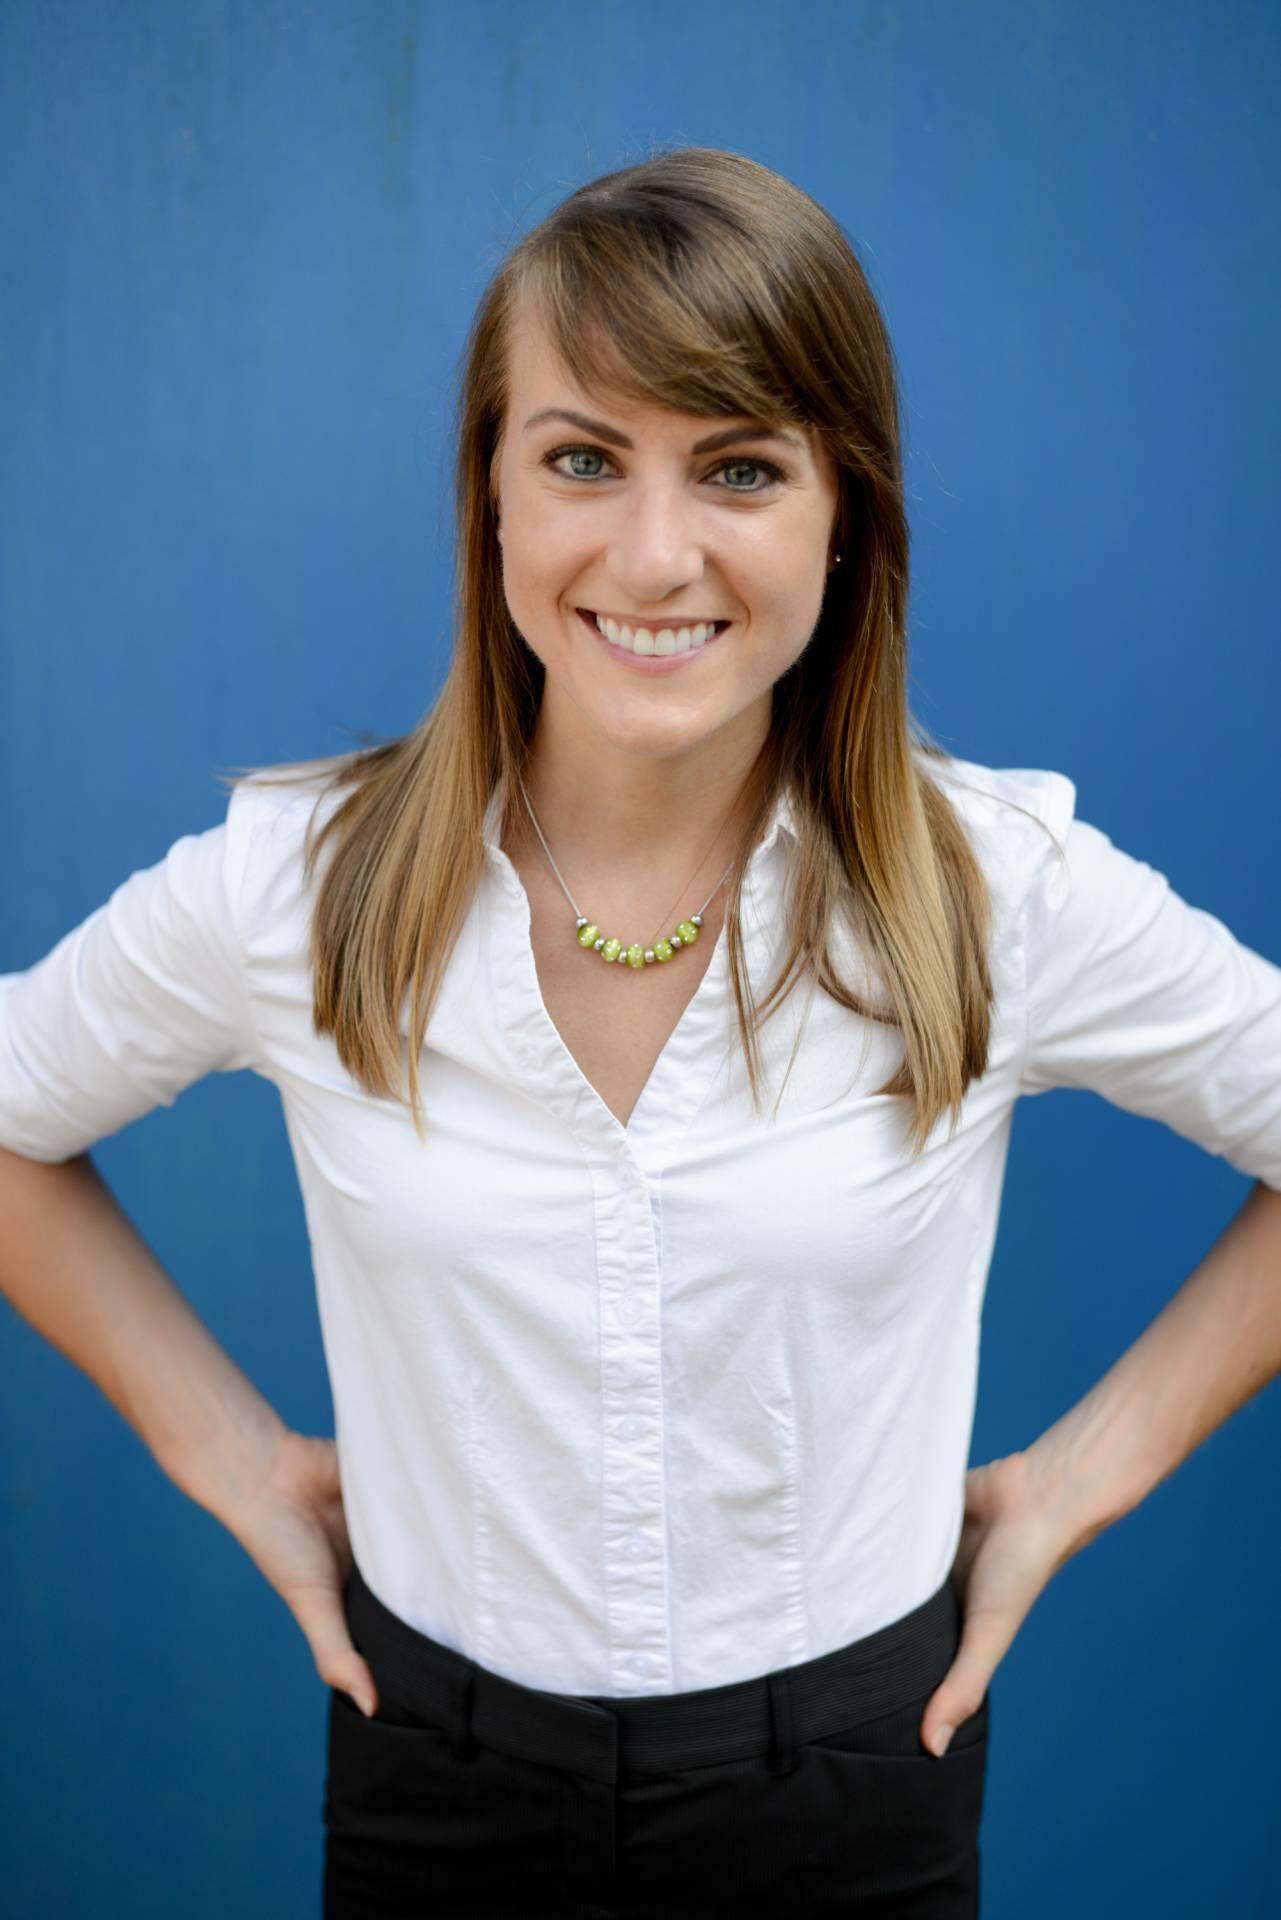 Dr. Jenna Zigler